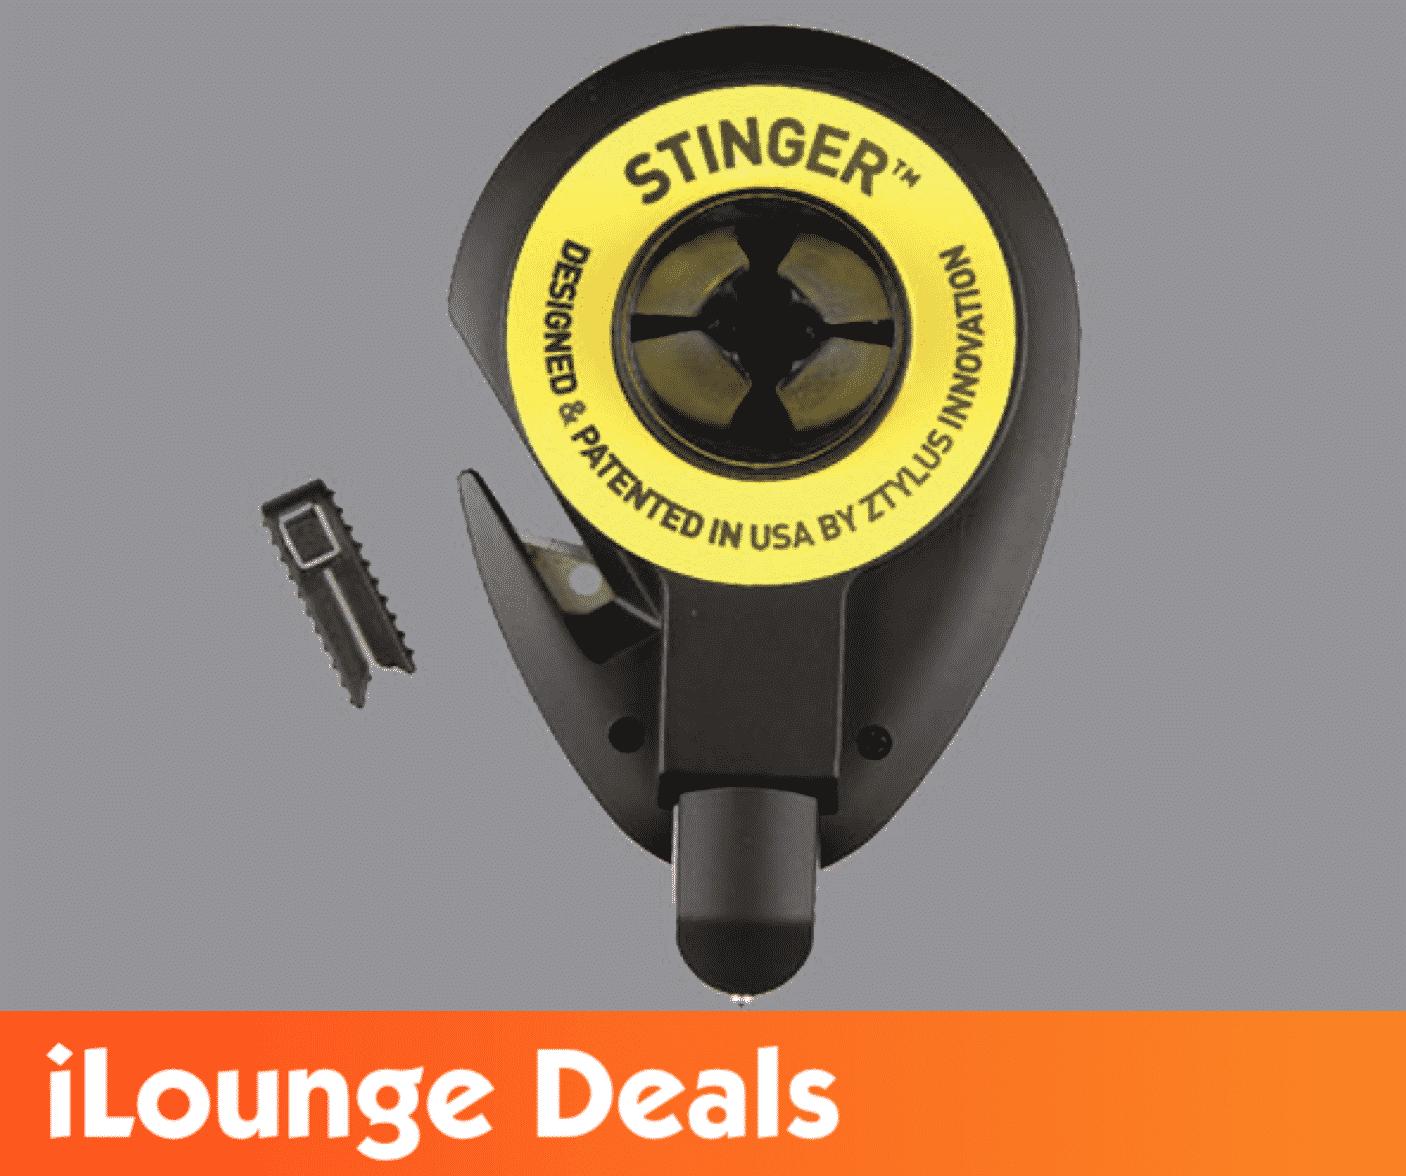 Stinger™ Car Vent Mount Phone Holder & Emergency Tool